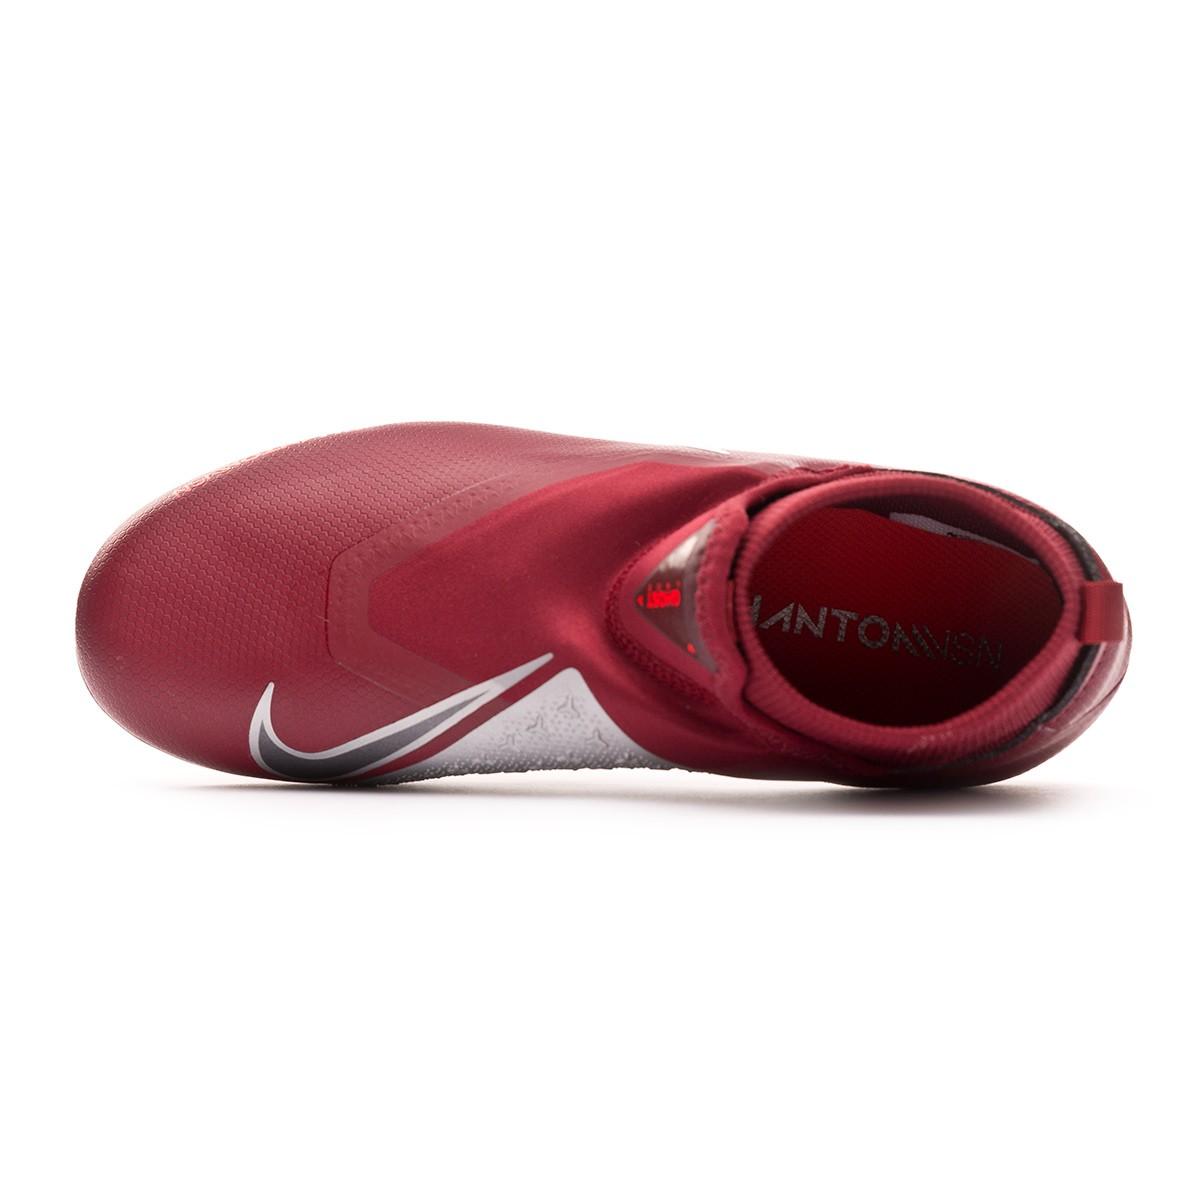 7c566c2bdd5de Football Boots Nike Kids Phantom Vision Academy DF MG Team red-Metallic  dark grey-Bright crimson - Tienda de fútbol Fútbol Emotion